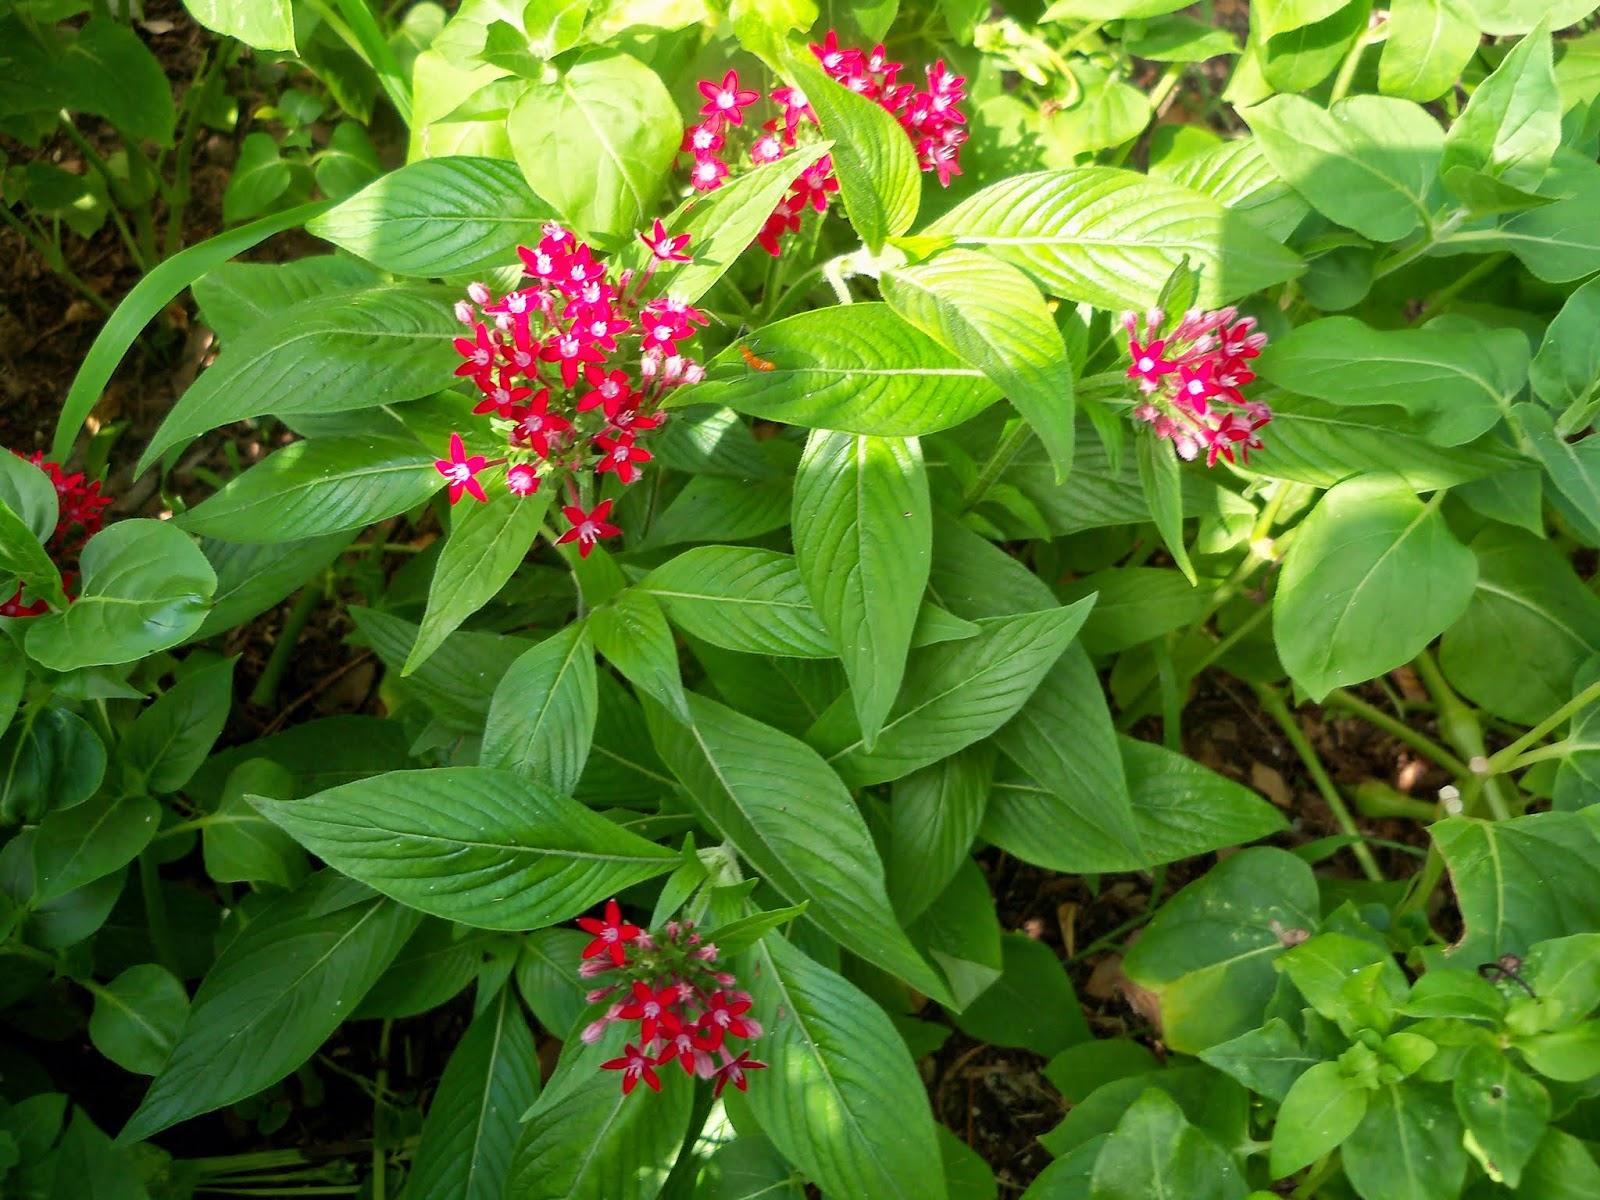 Gardening 2014 - 116_3242.JPG